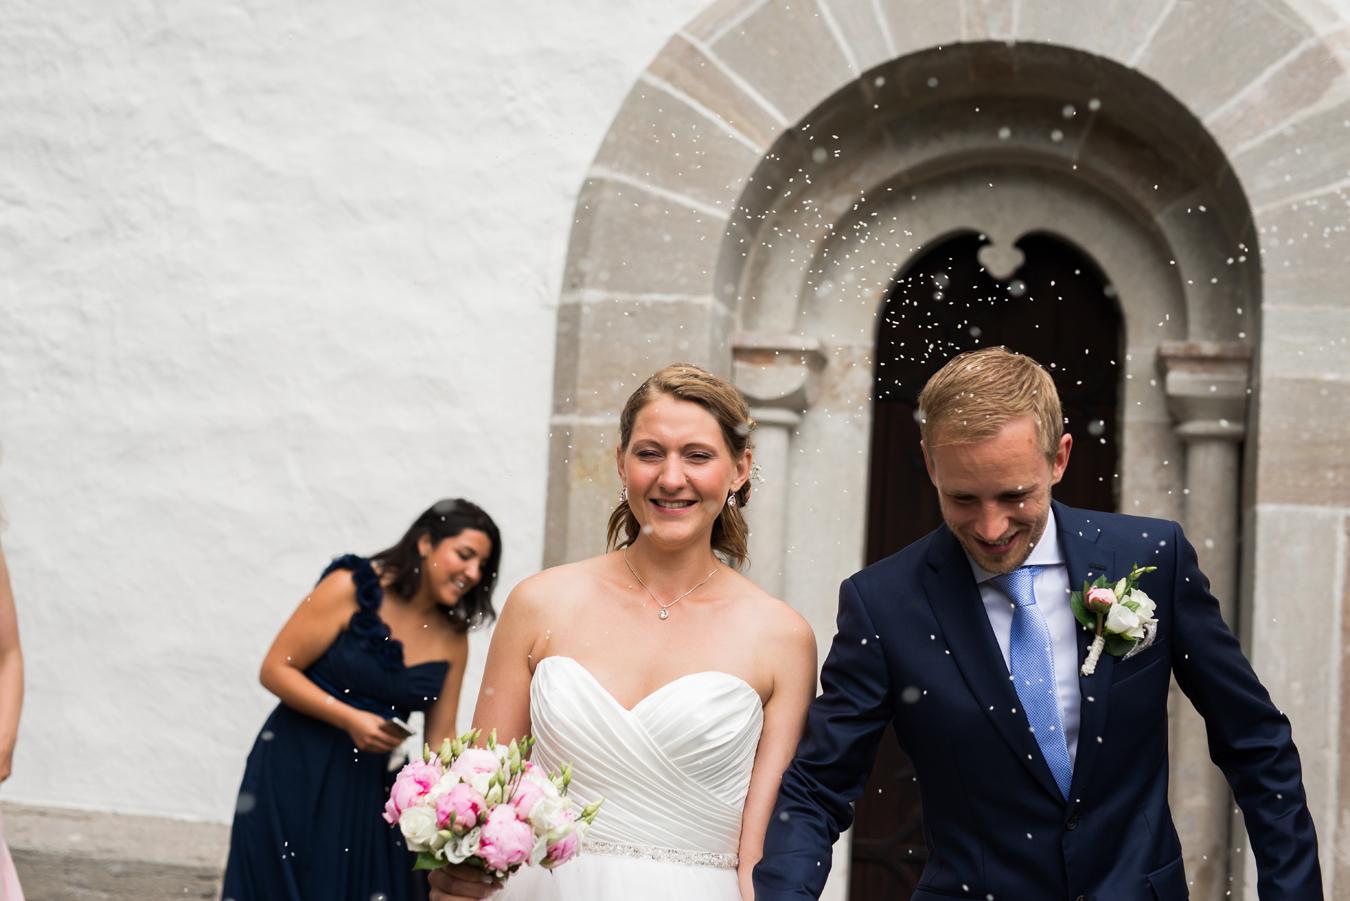 008-bröllopsfotograf-folhammar-gotland-neas-fotografi.jpg